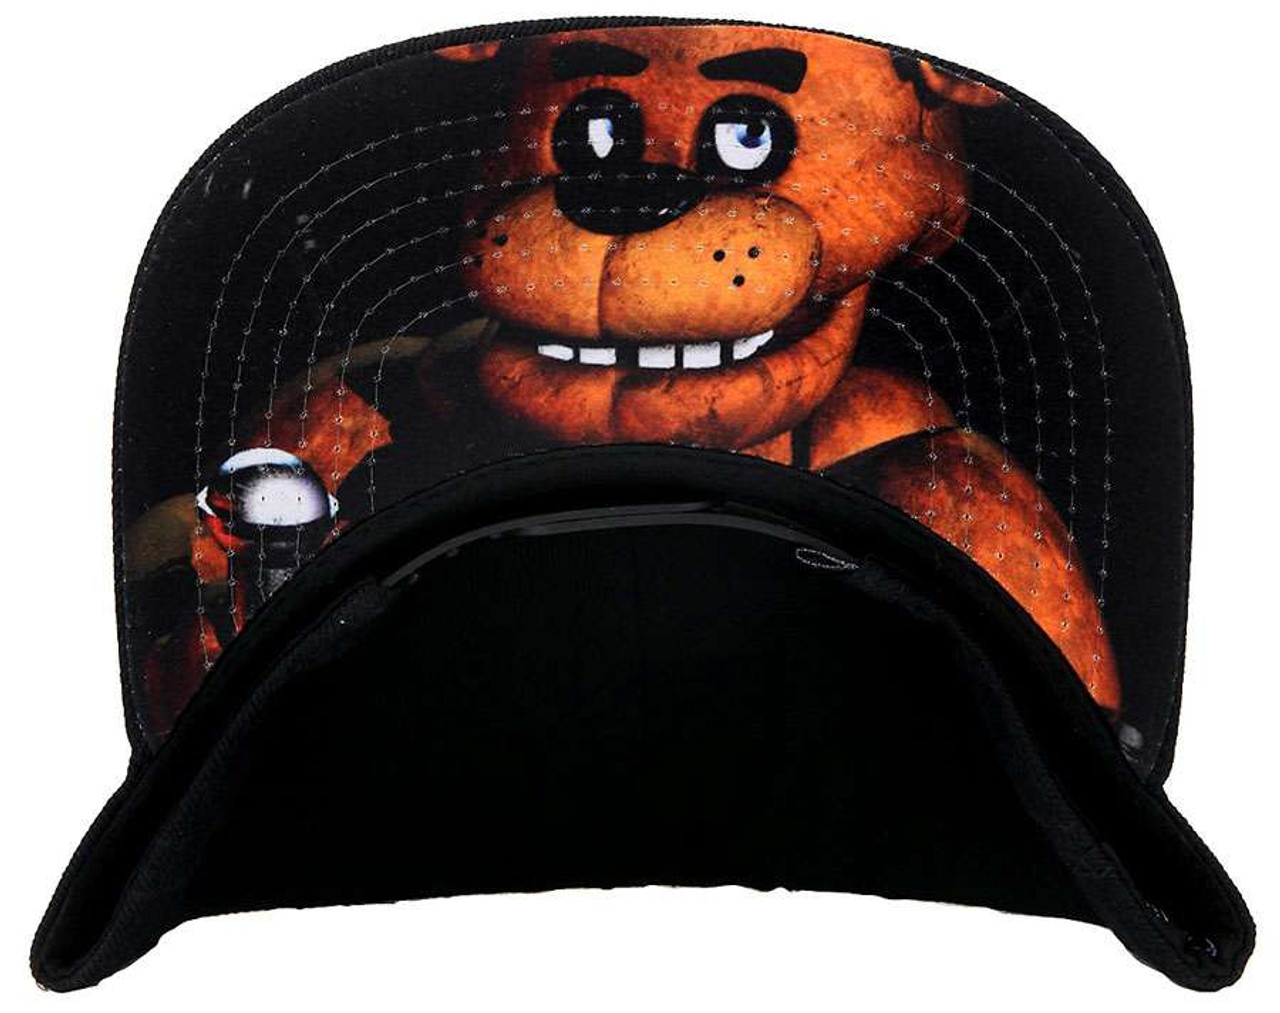 3fdb092f42d8ef Five Nights at Freddys Freddy Fazbears Pizza Exclusive Baseball Cap  Bioworld - ToyWiz